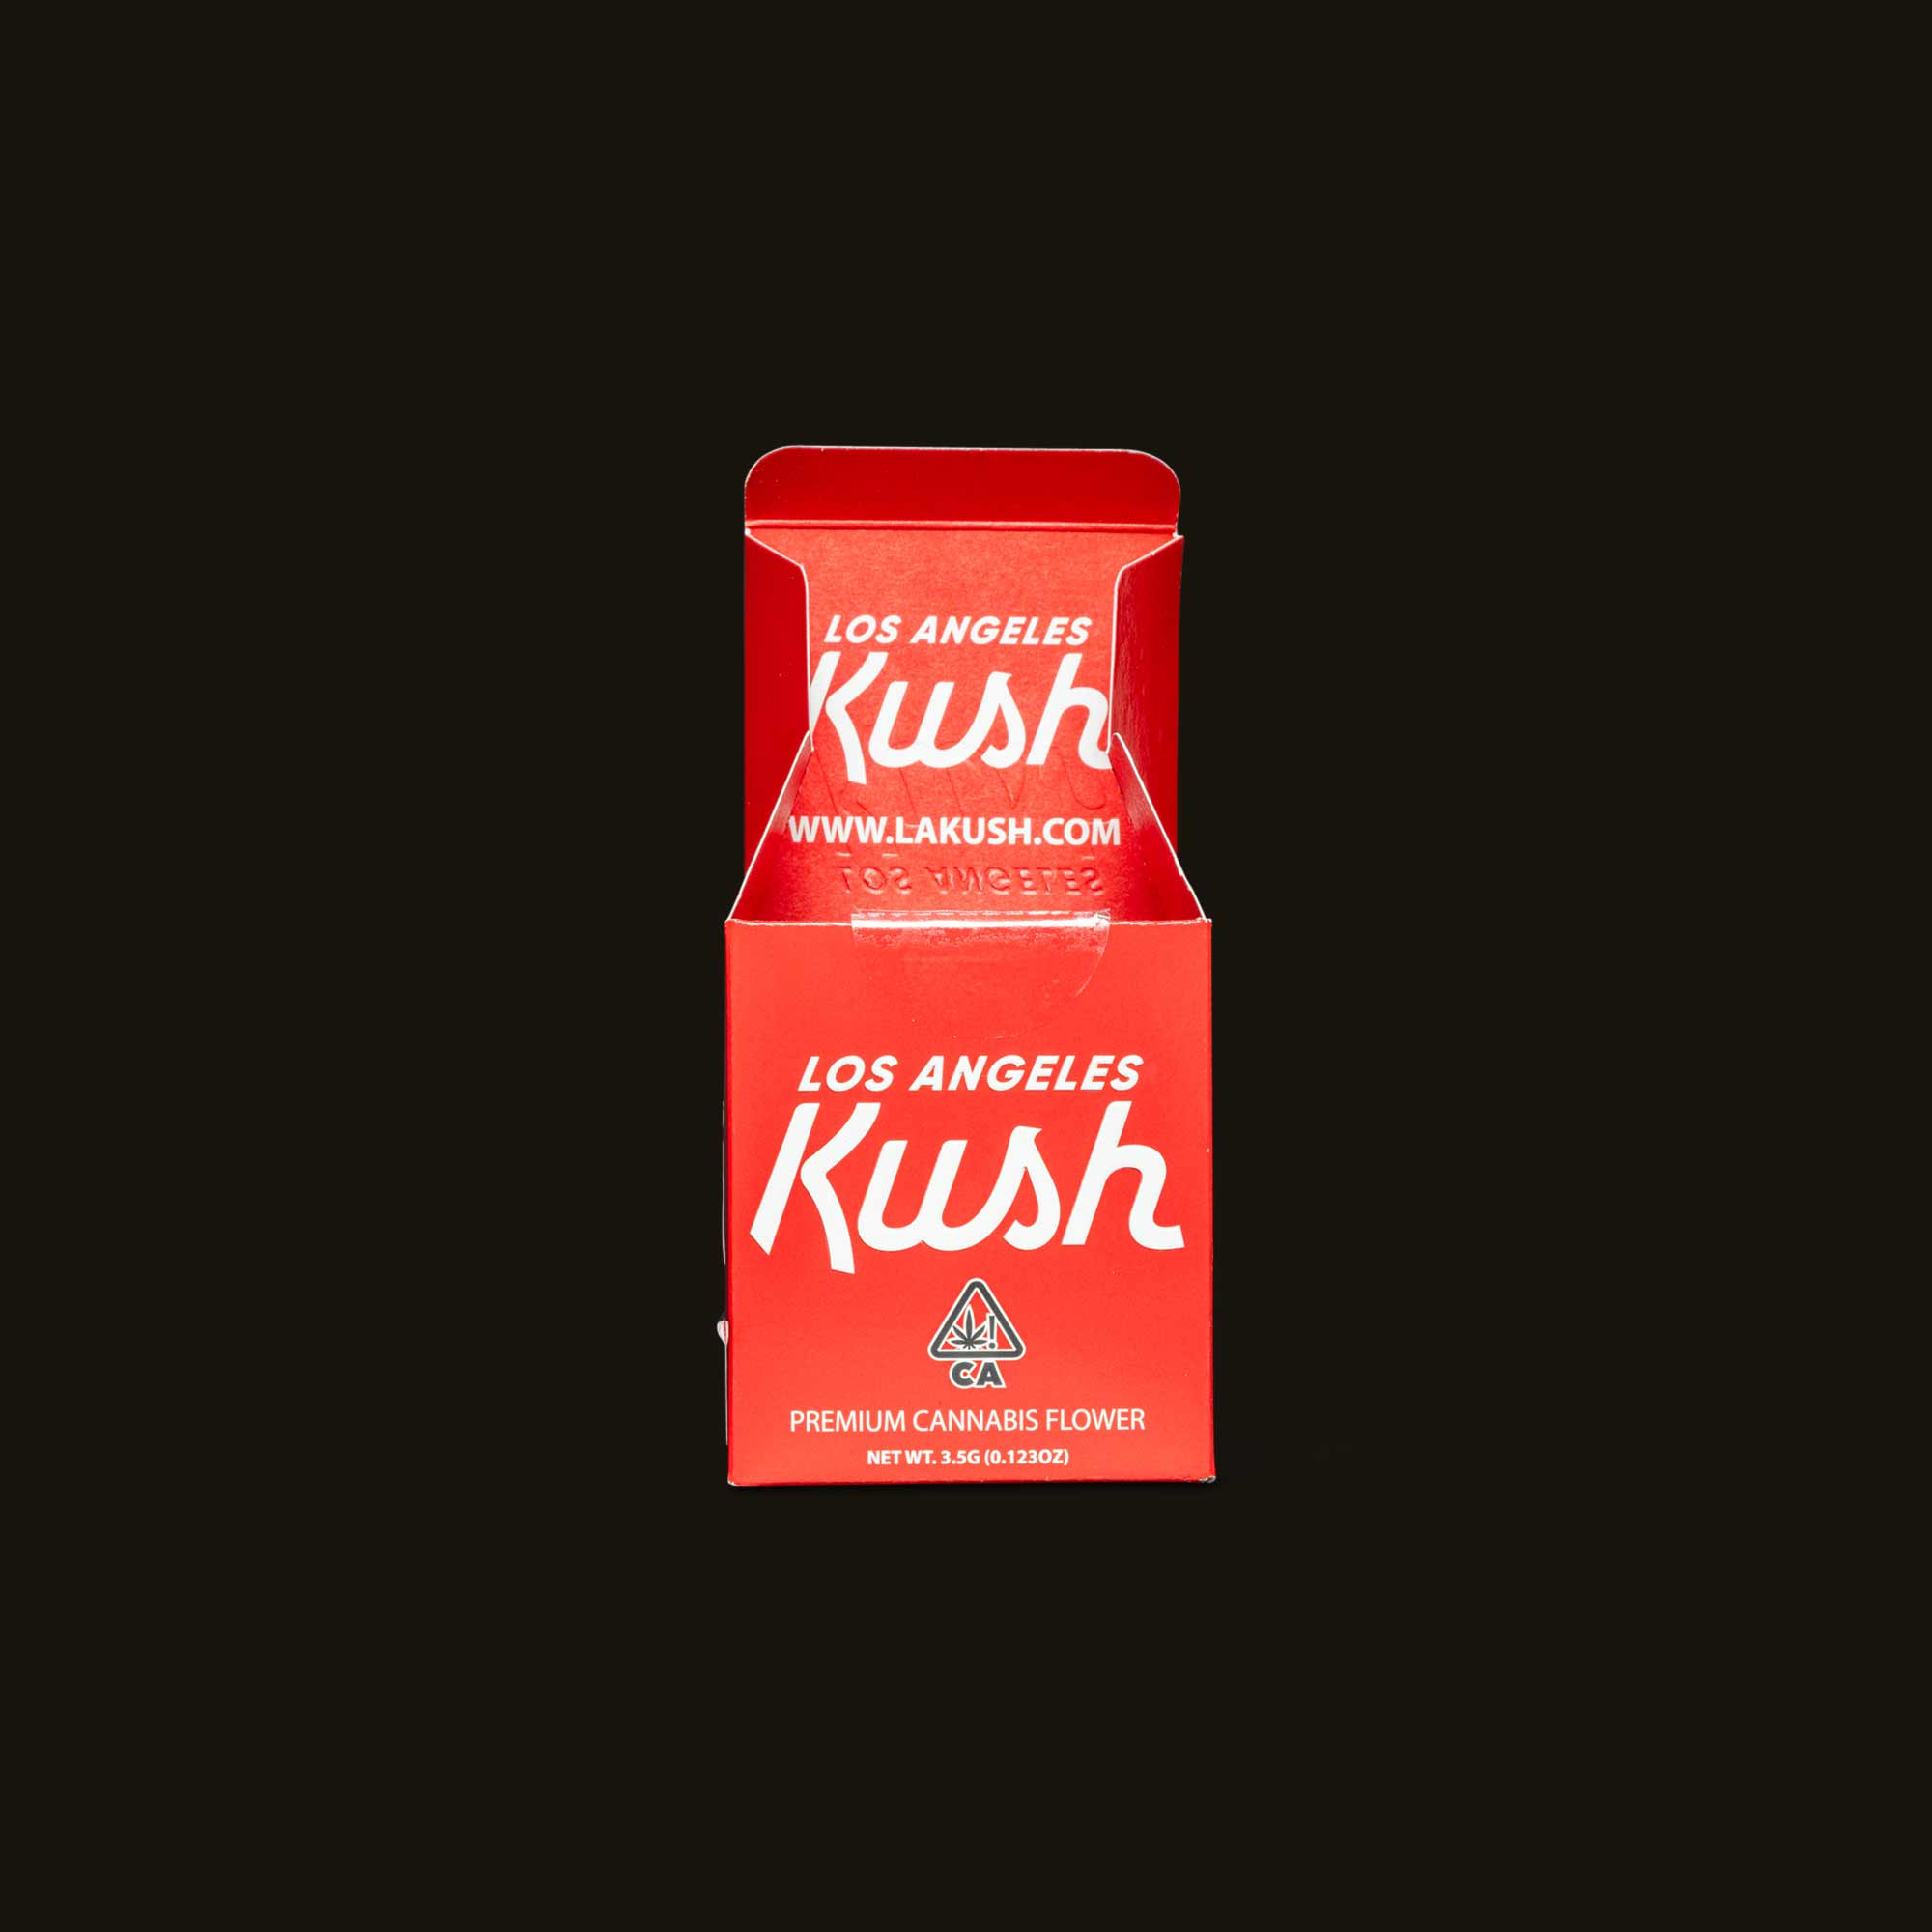 LA Kush Red Box